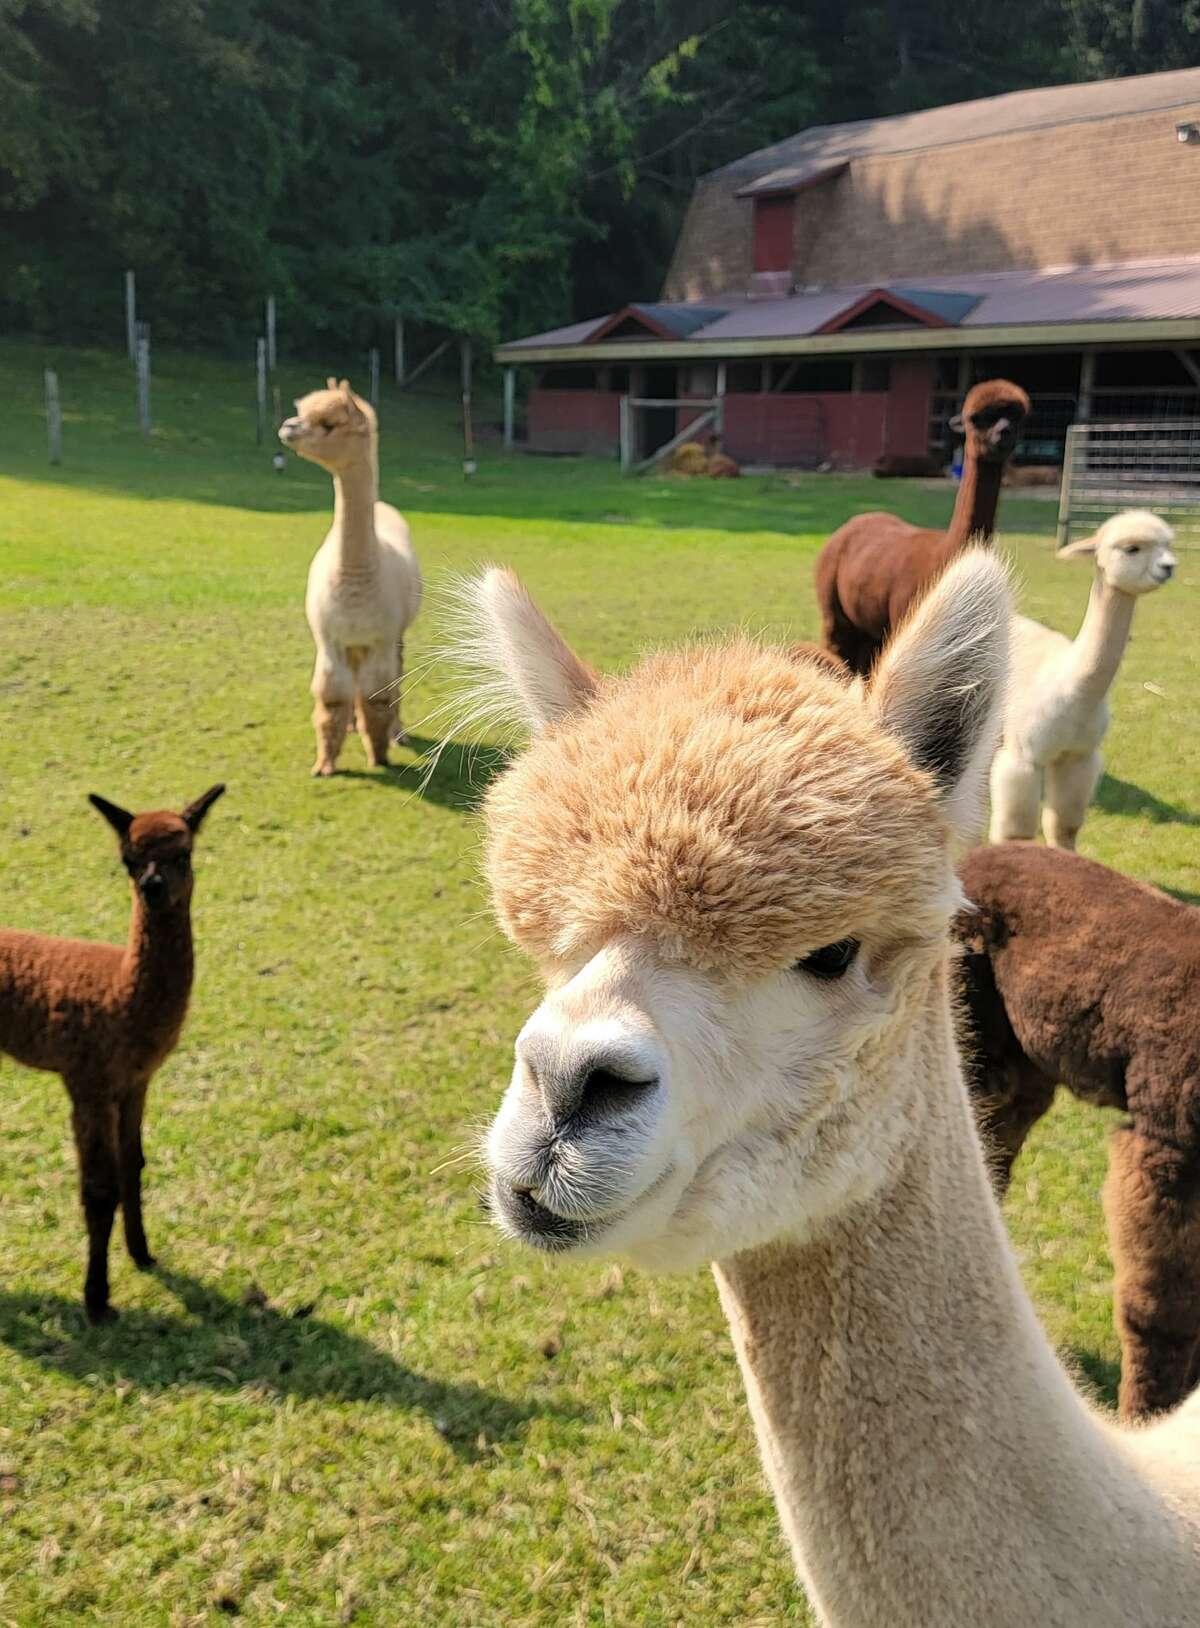 Visitors got a closer look at the alpacas at Crystal Lake Alpaca Farm on Saturday.